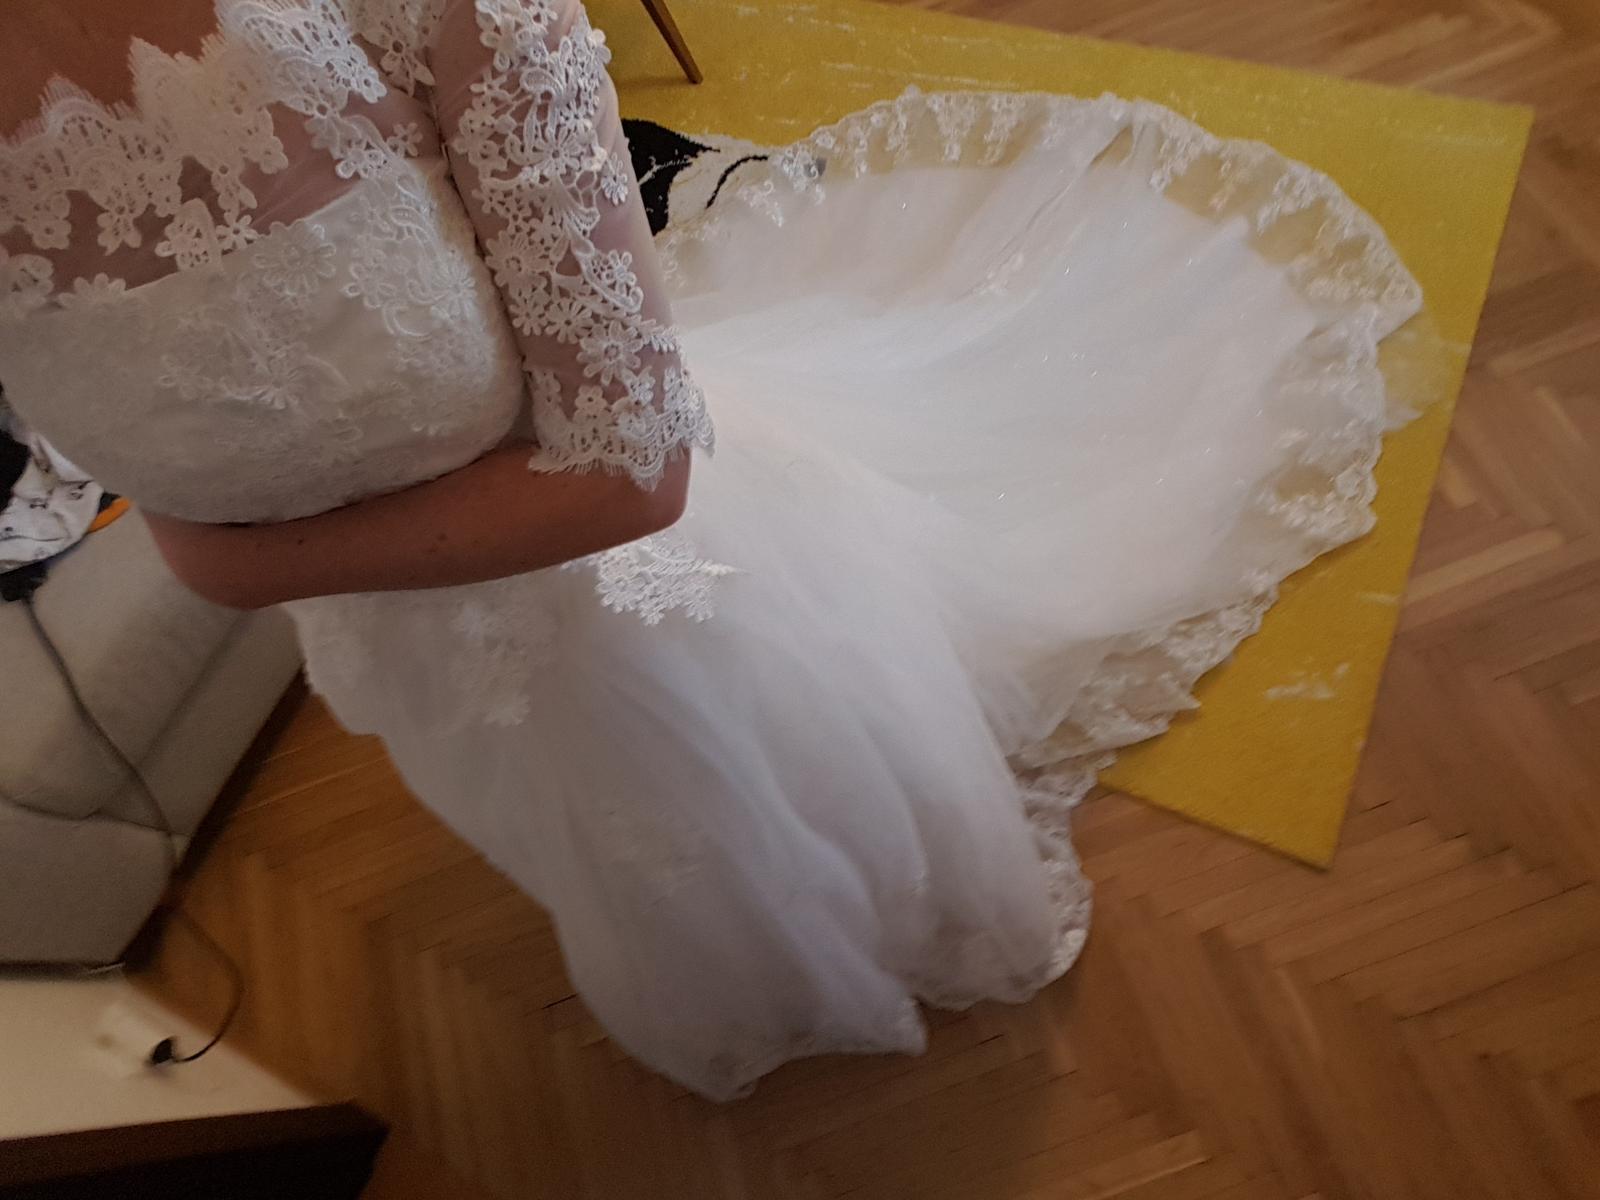 Svadobné šaty S/36 - Obrázok č. 2